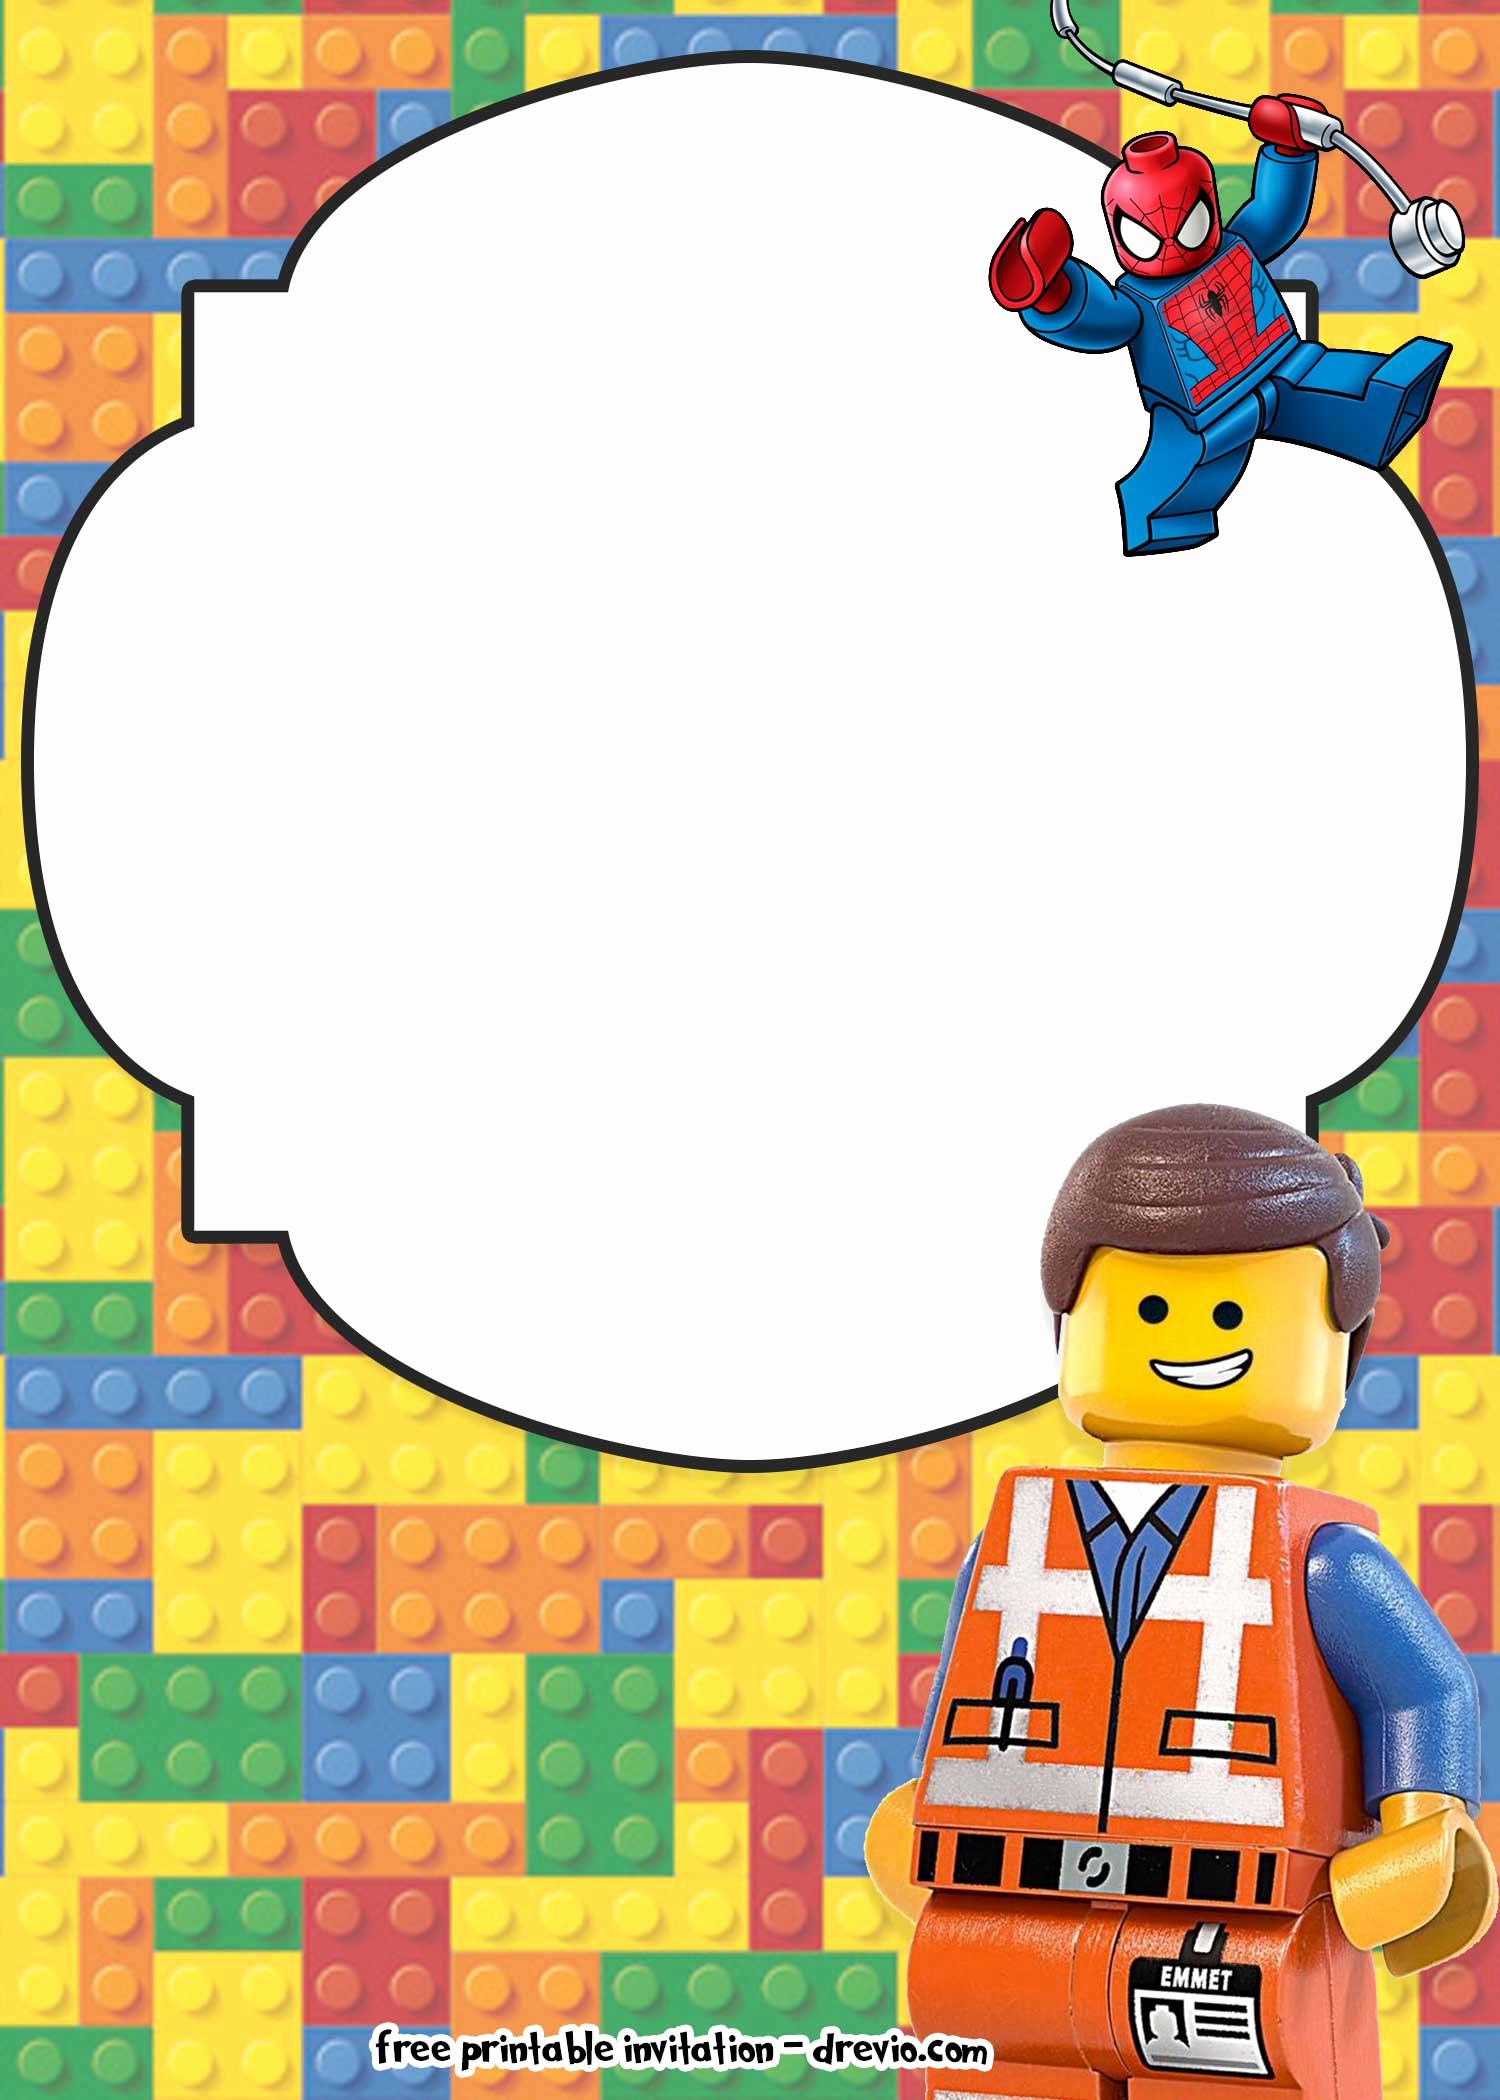 Lego Birthday Invitation Template Lovely Free Lego Movie Invitations for Birthday